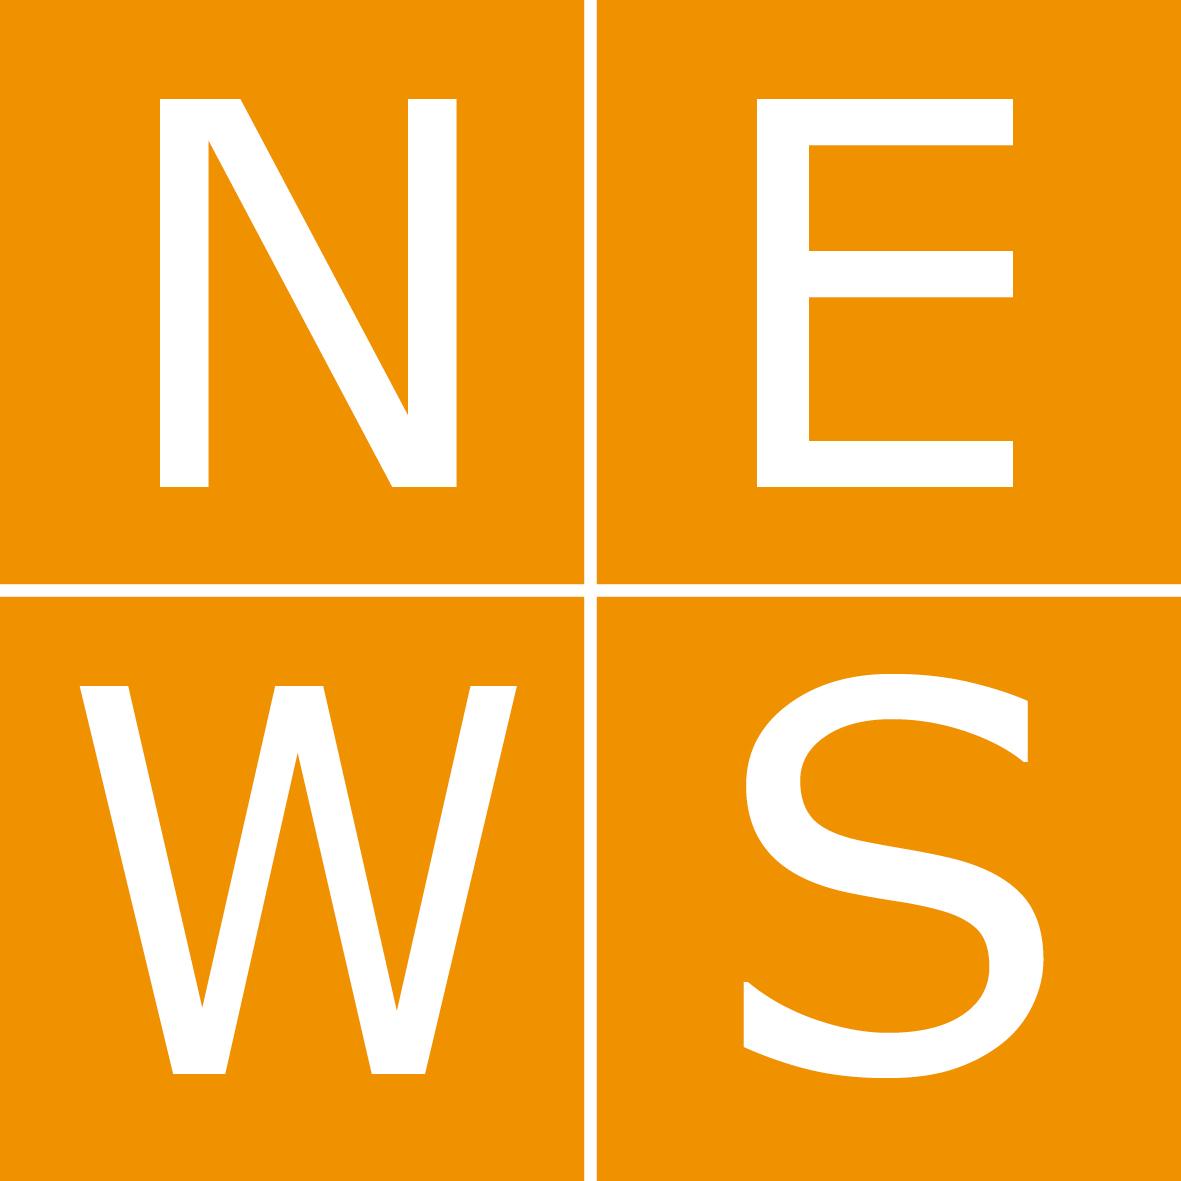 News #kooplive